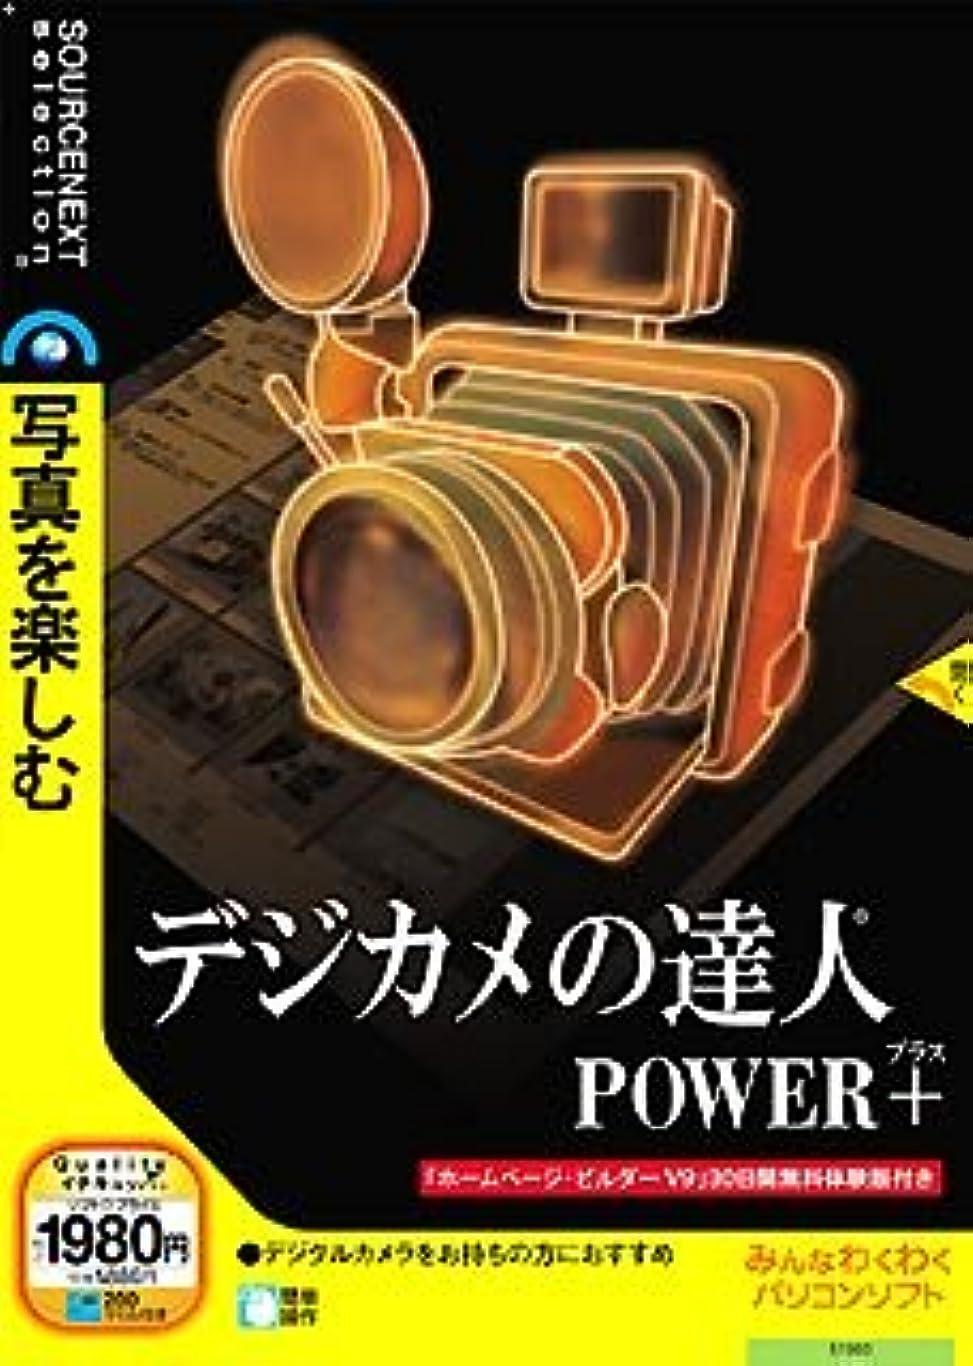 SOURCENEXT Selection IBM デジカメの達人 POWER + (説明扉付きスリムパッケージ版)